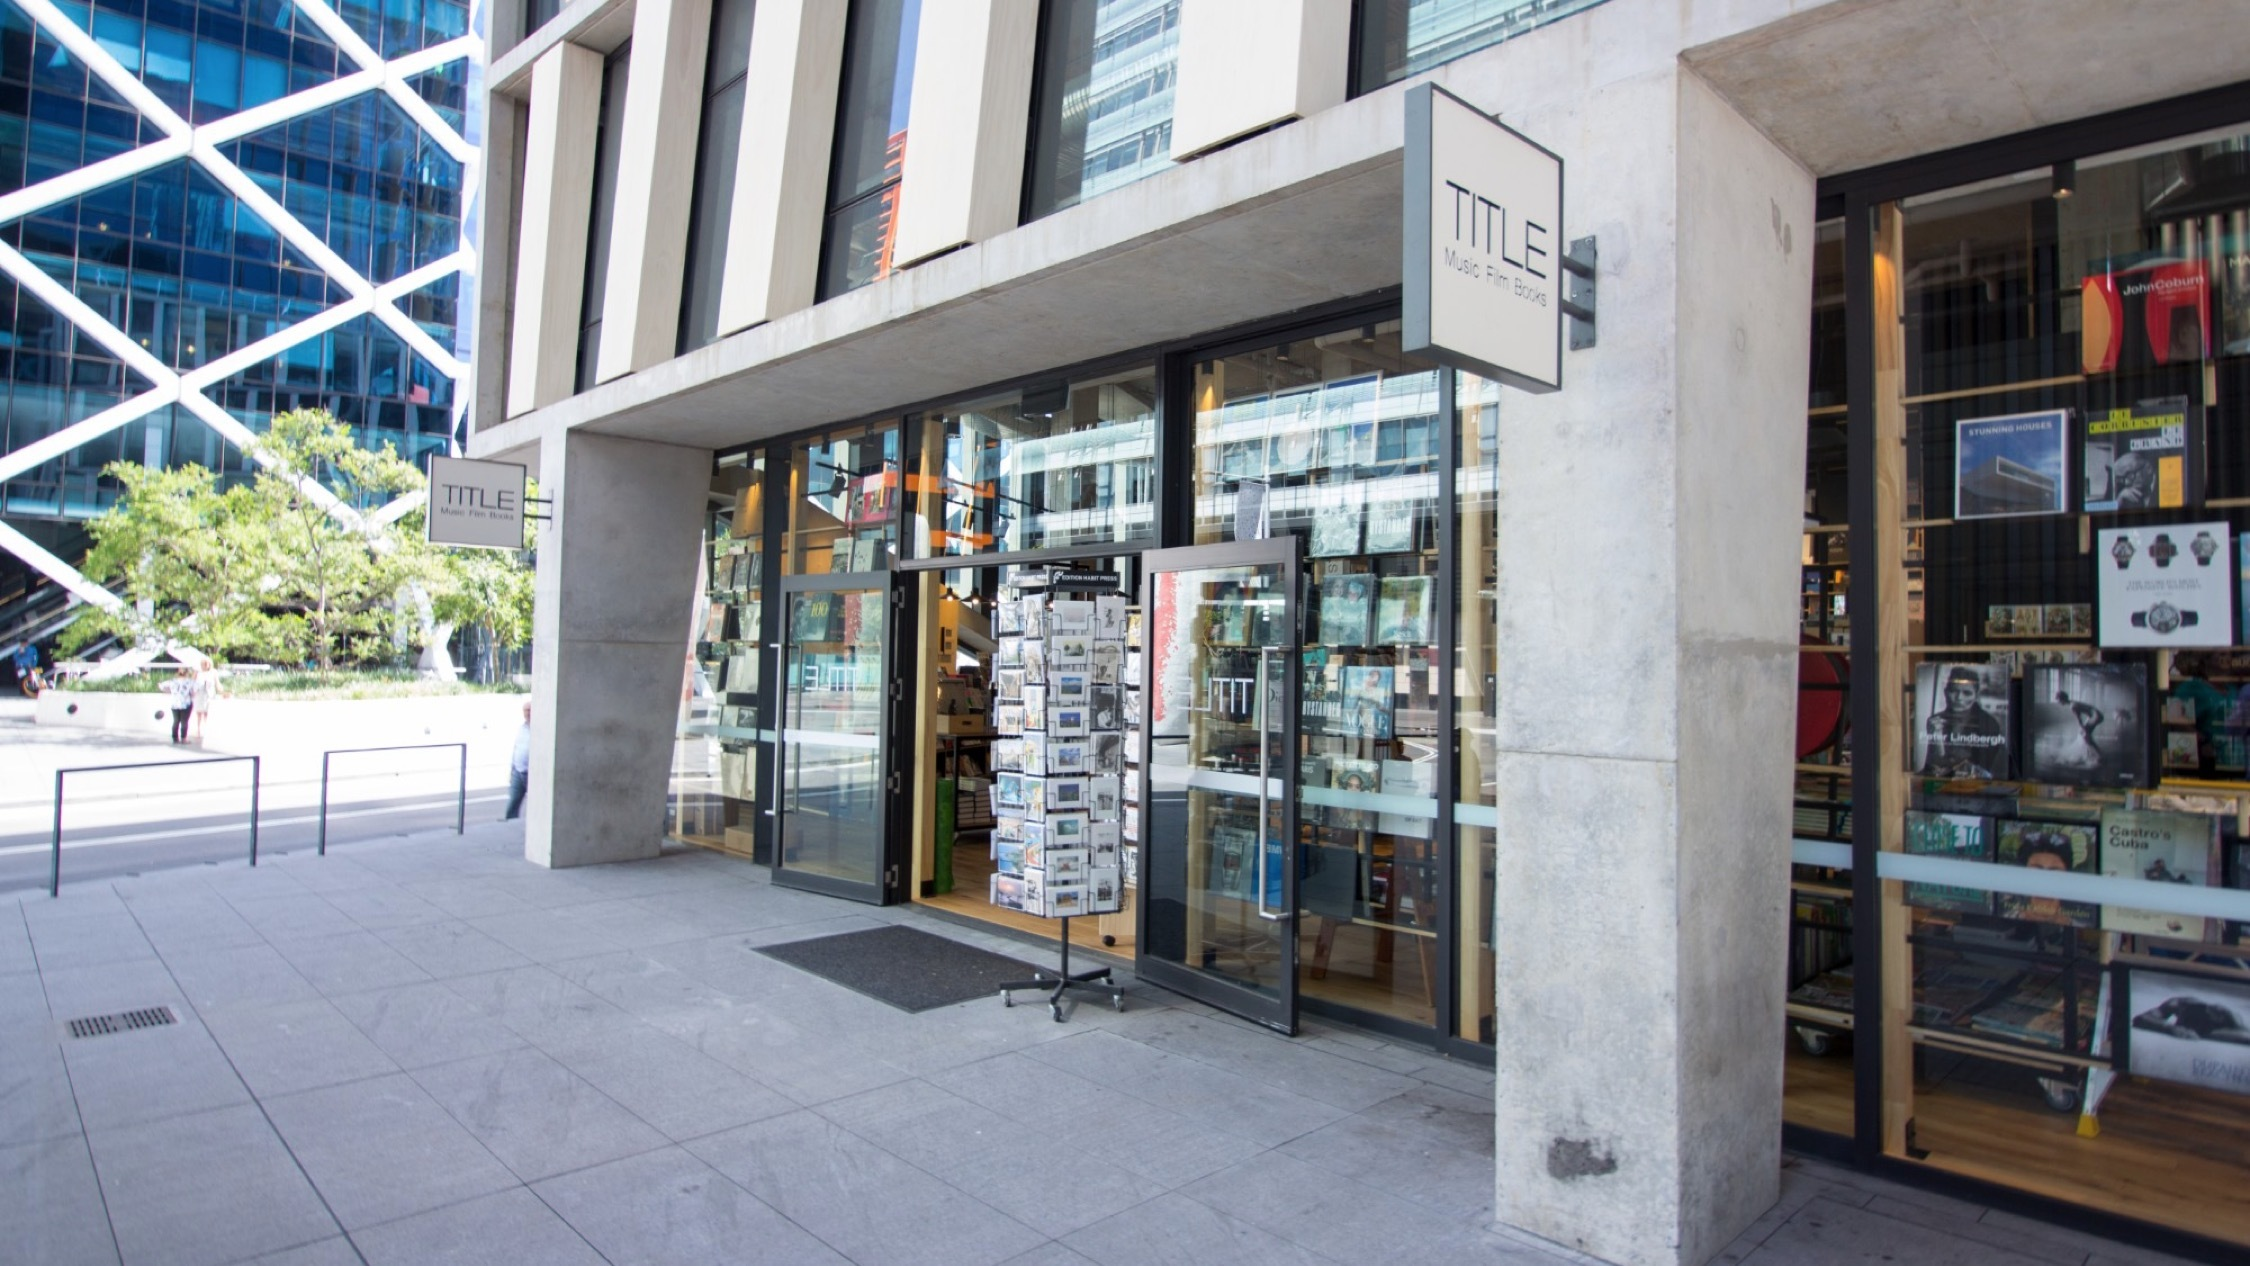 Outside at Title Book Store Barangaroo